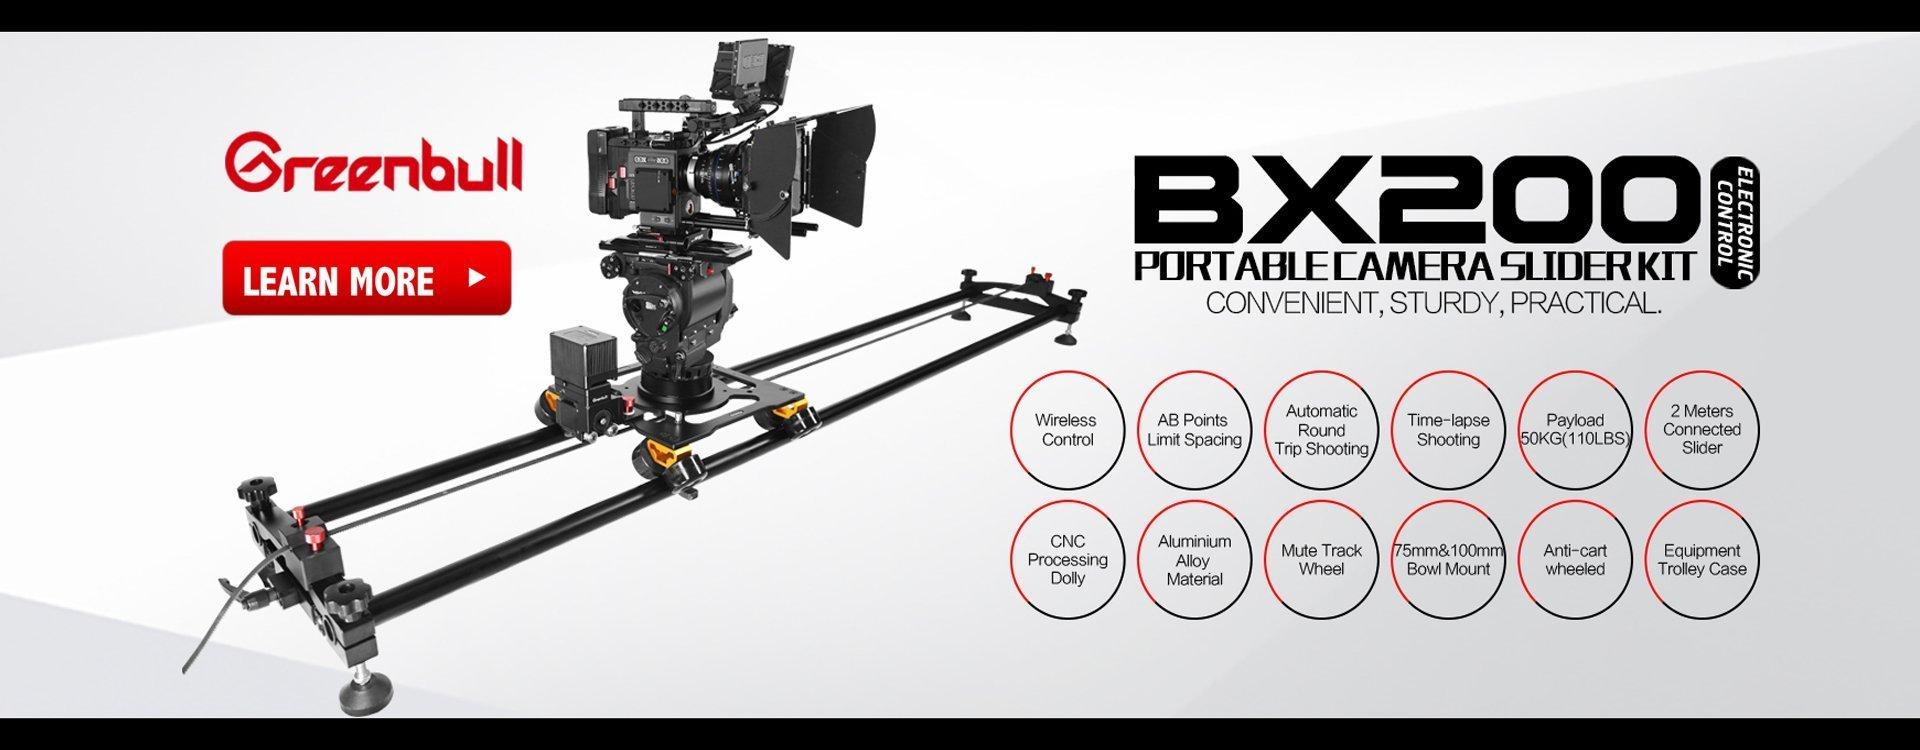 Greenbull BX200 Camera Slider